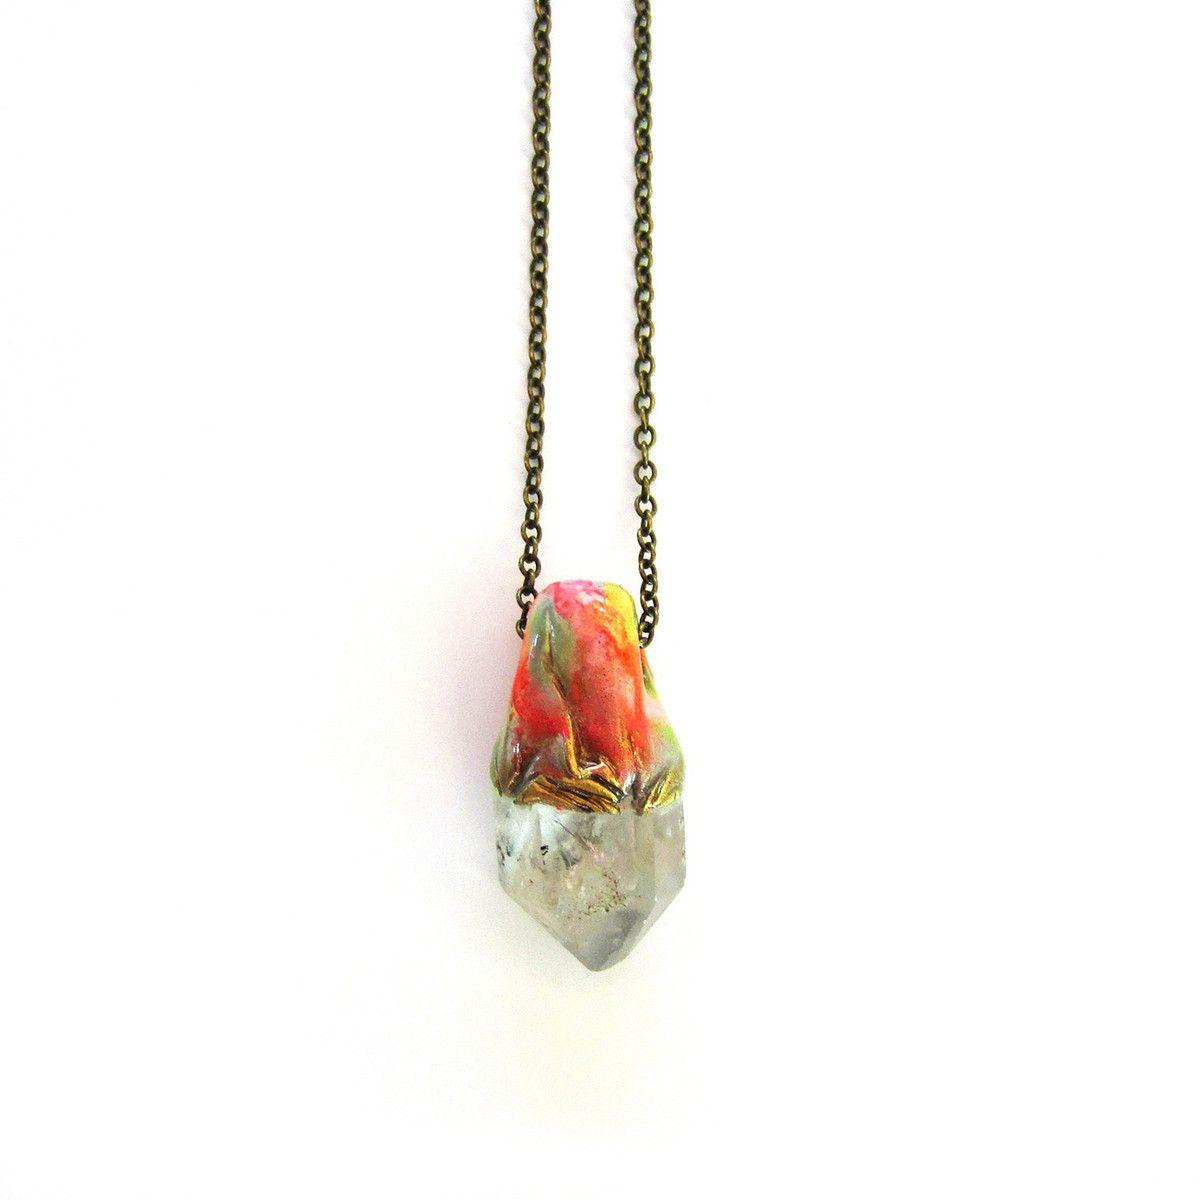 Fairy Dreams Necklace by ADINA MILLS DESIGNHOUSE